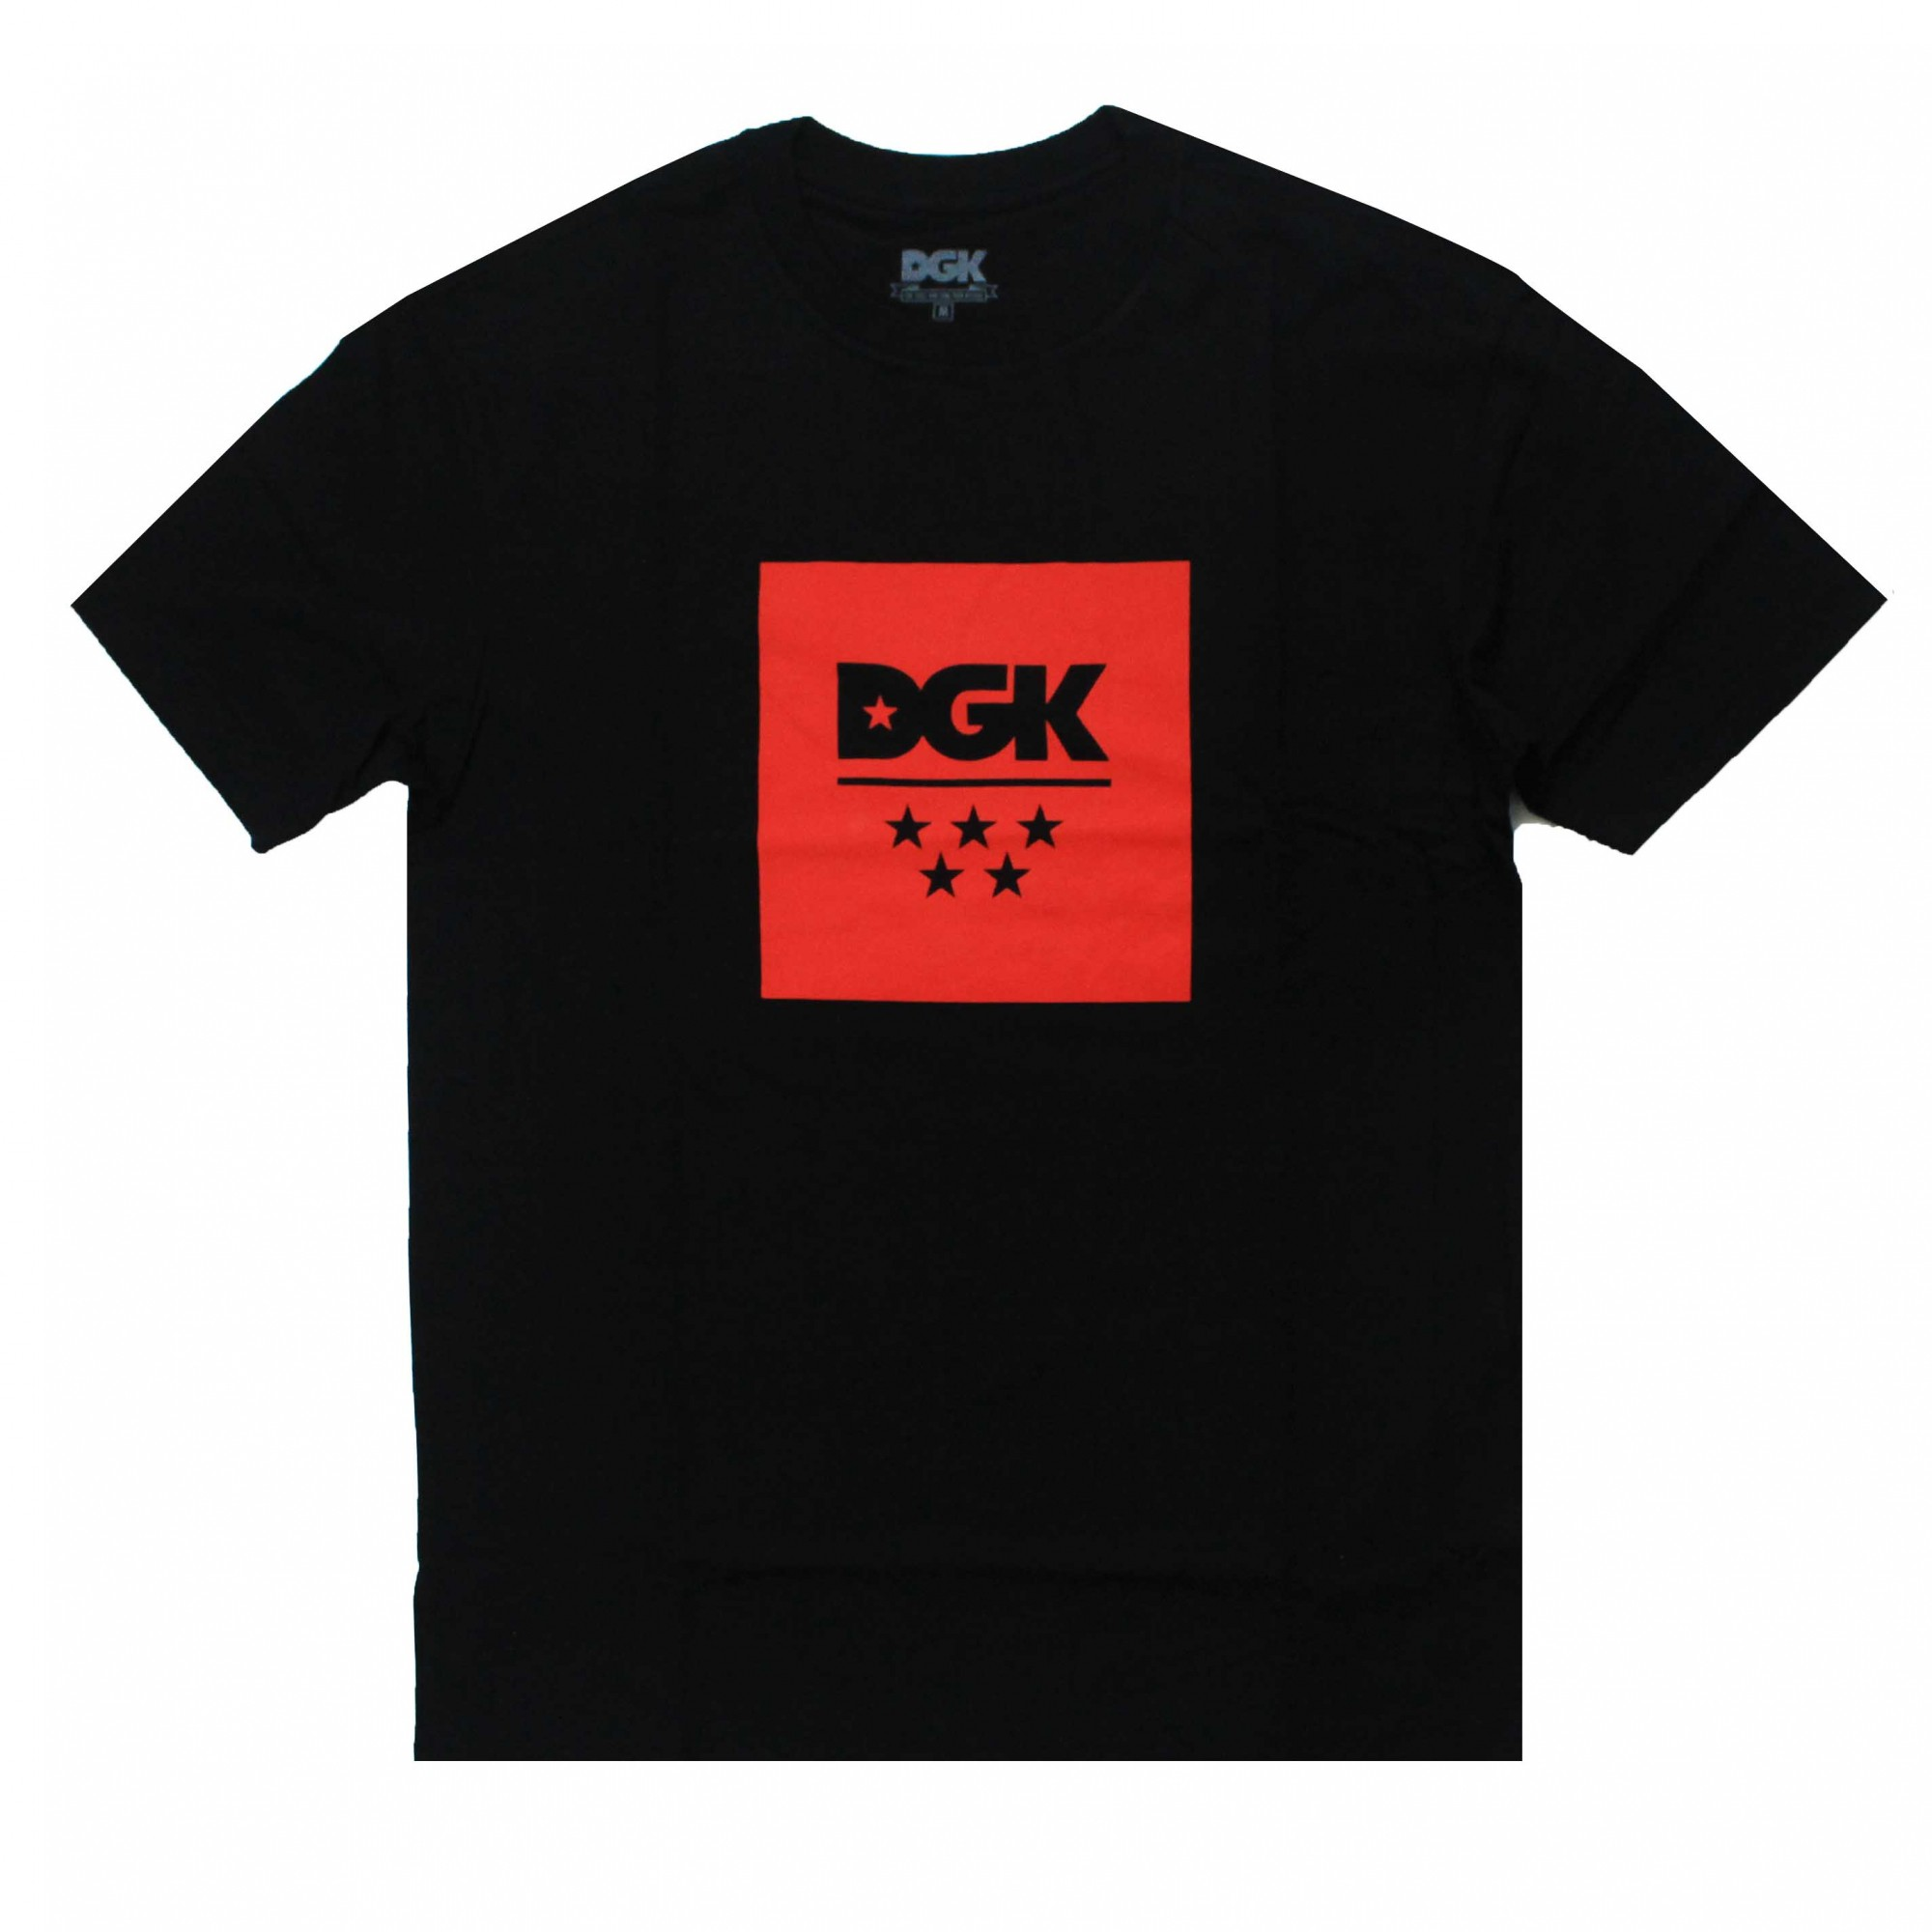 Camiseta DGK New All Star Preto/Vermelho